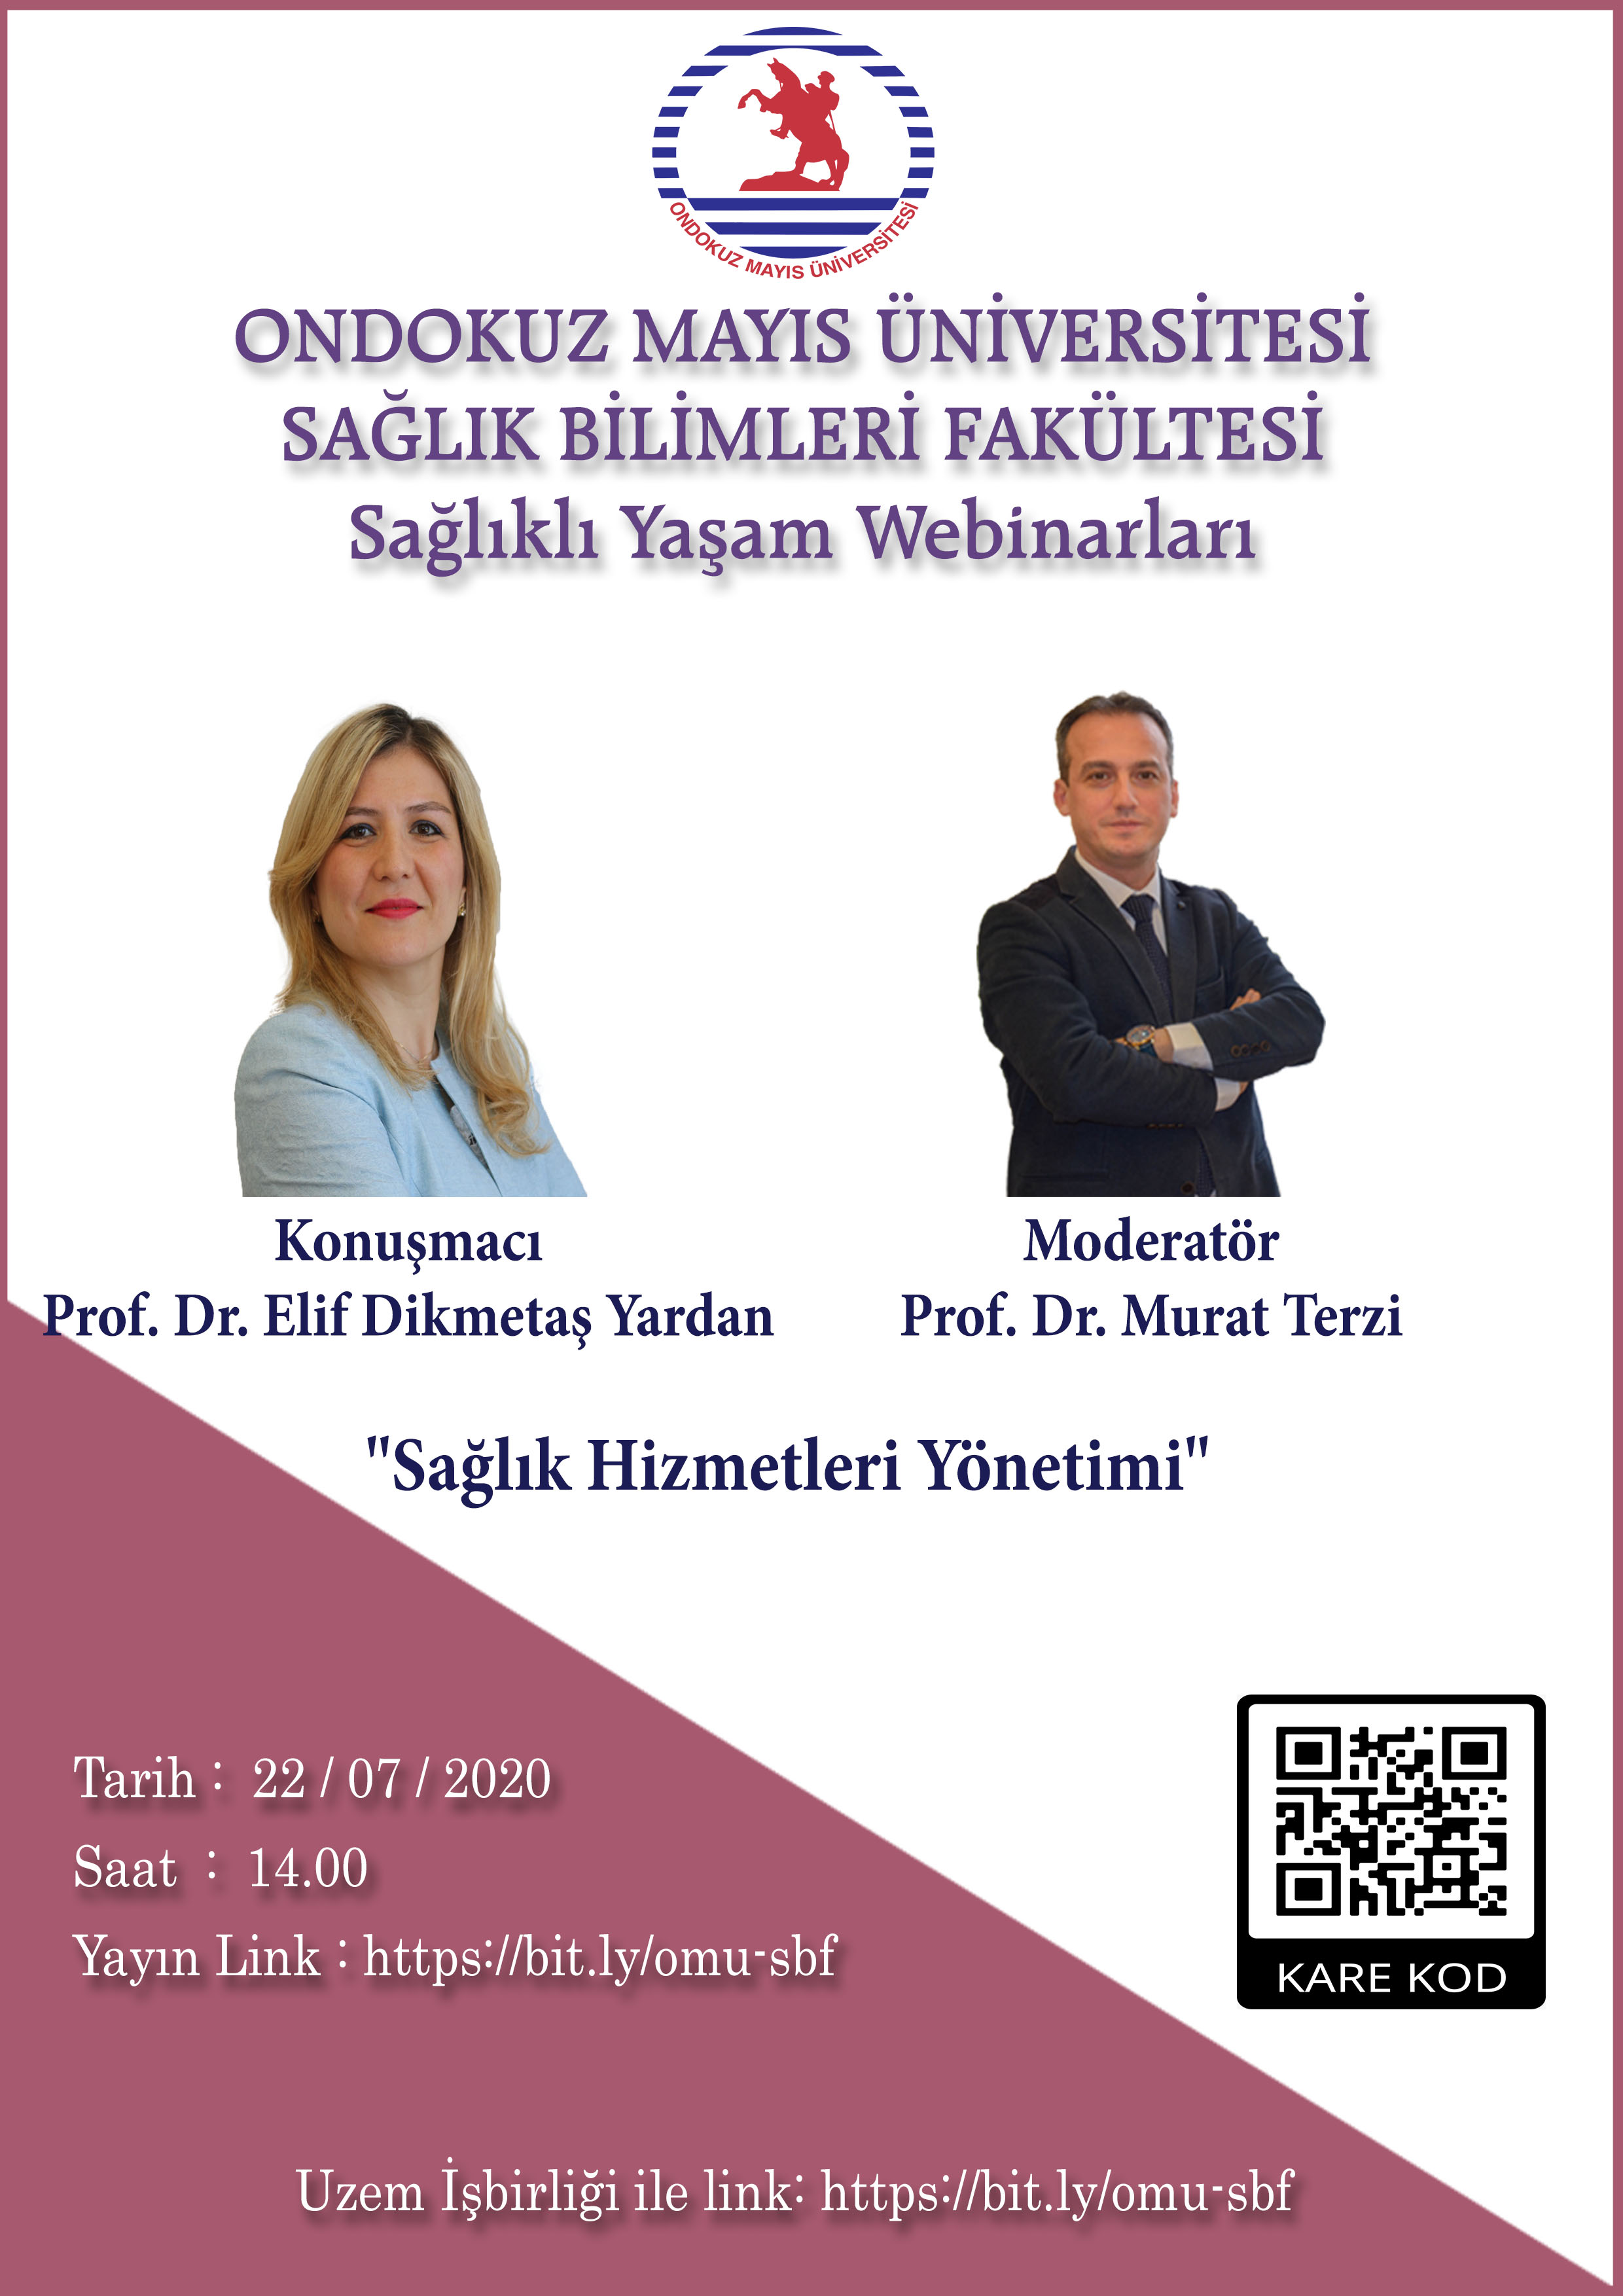 http://www.omu.edu.tr/sites/default/files/saglikli_yasam_webinarlari_-_3.jpg